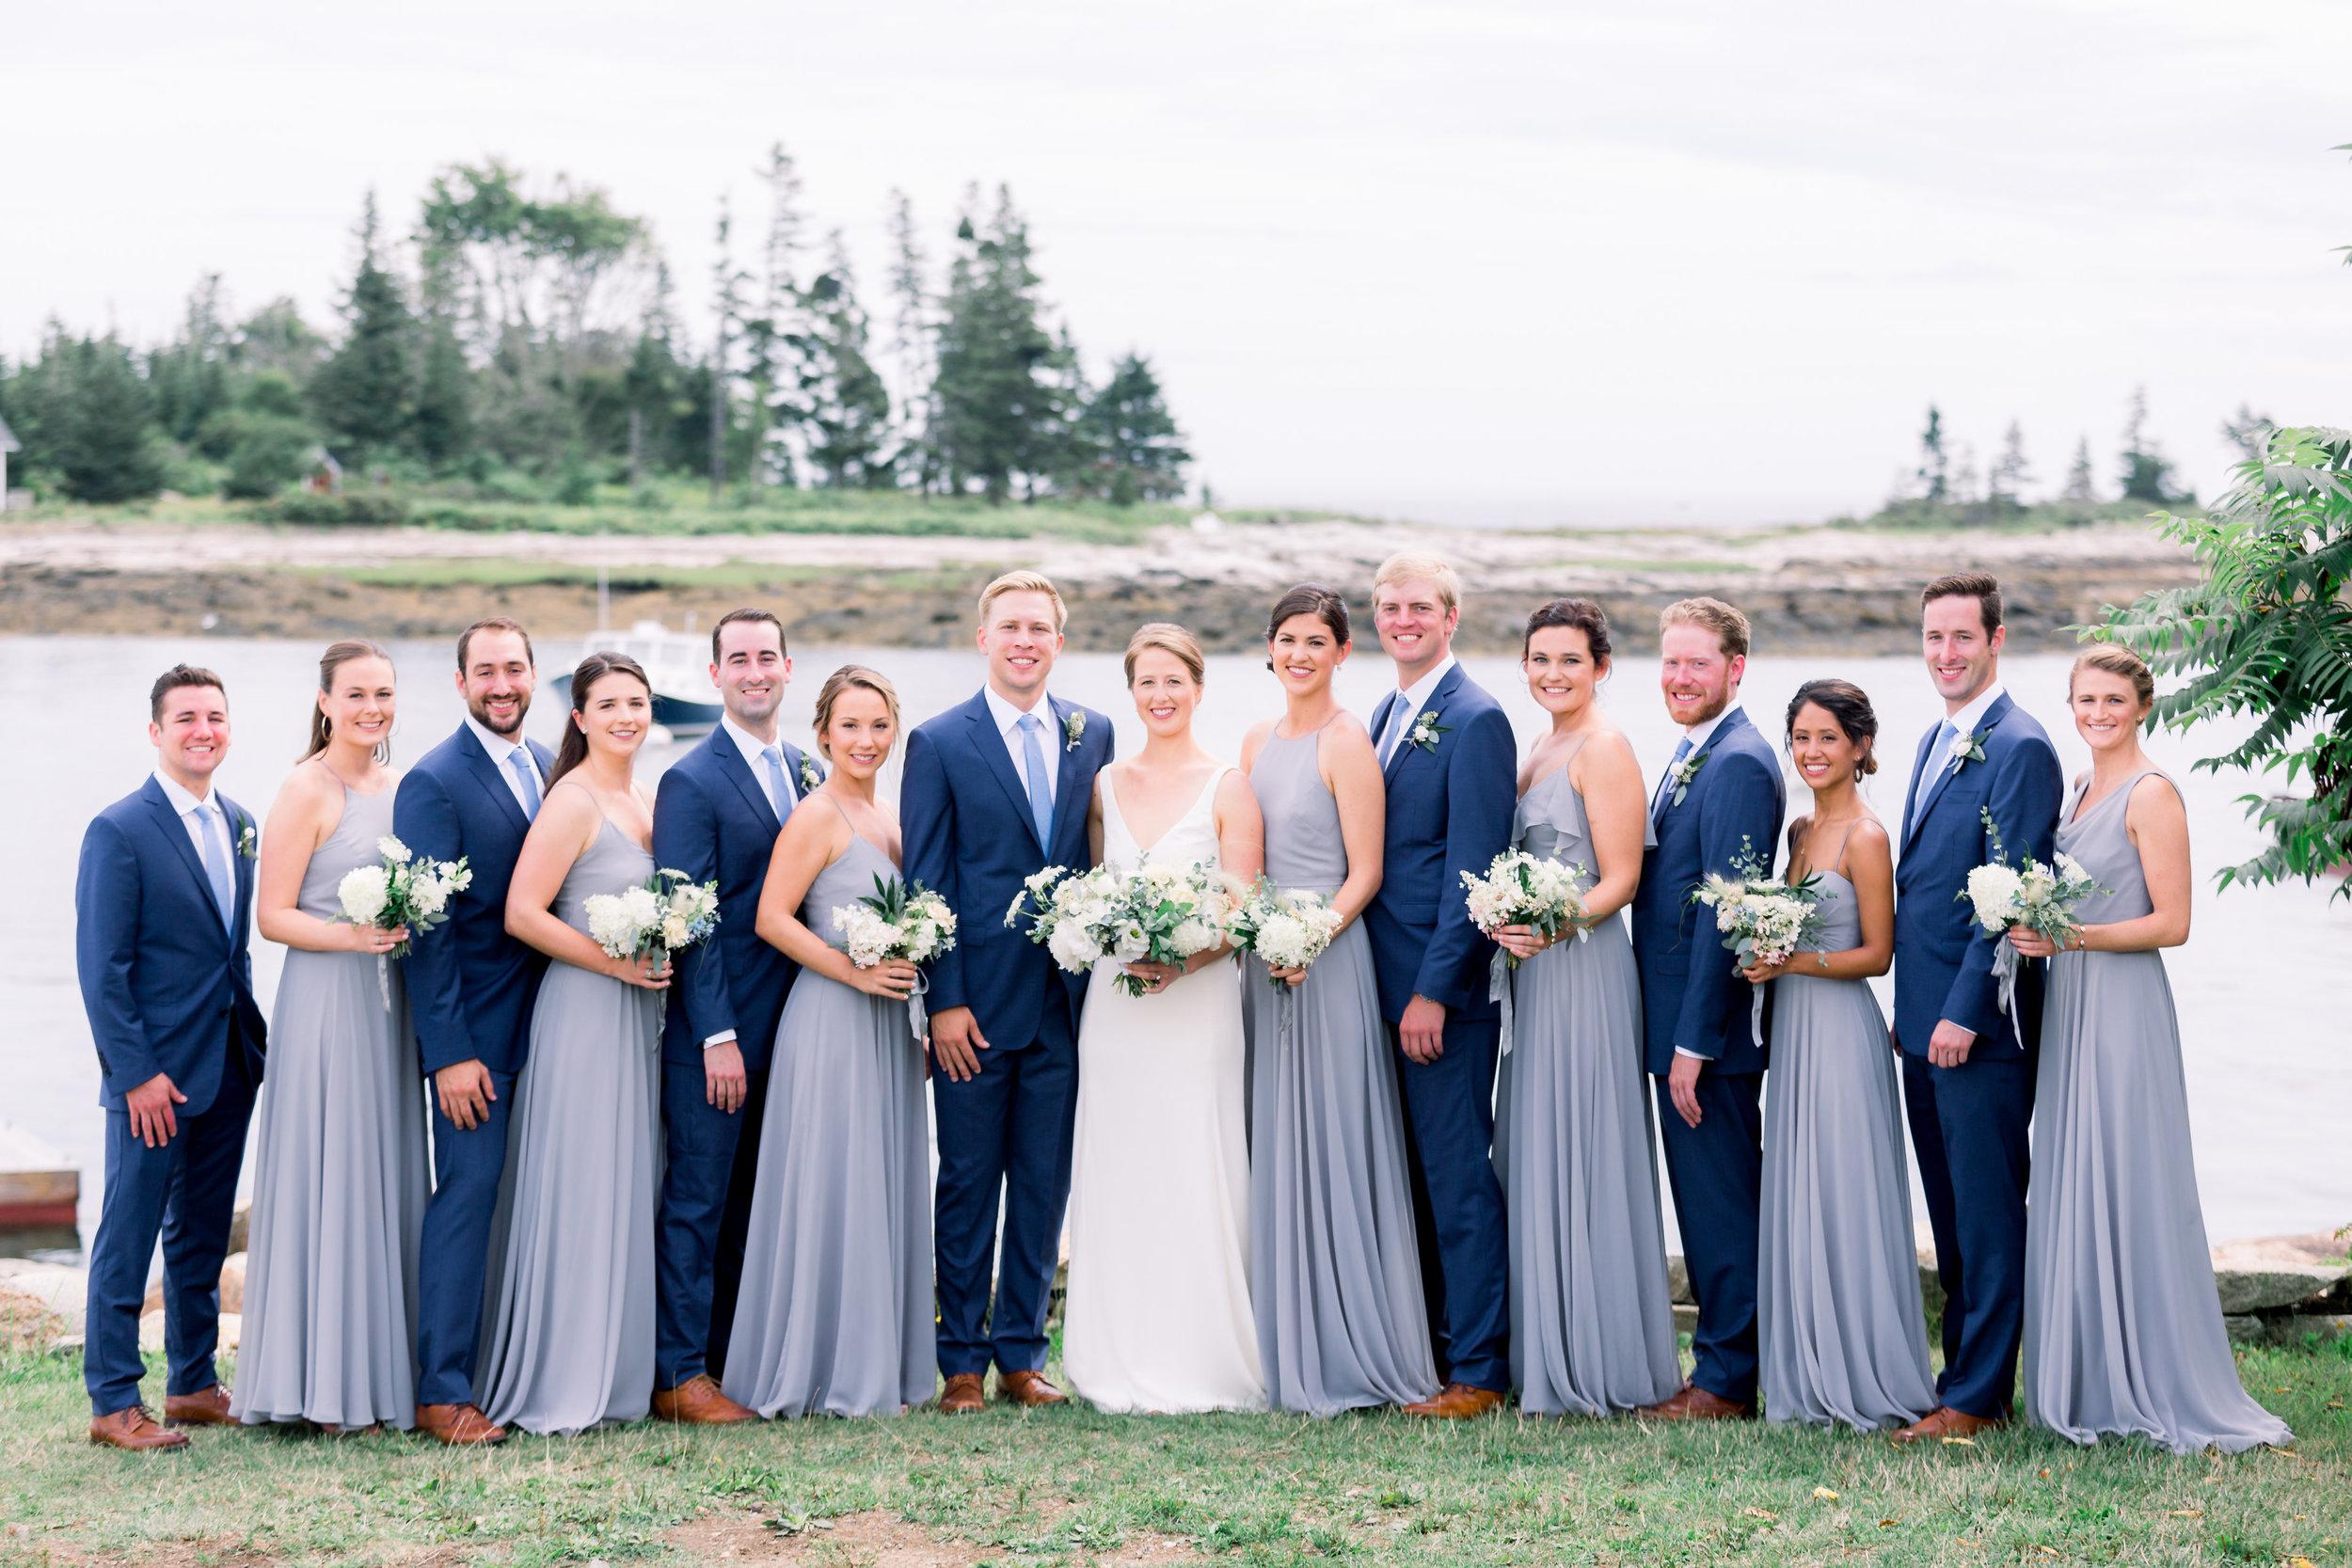 Watershed_Floral_Newagen_Wedding_Maine_5596.jpg